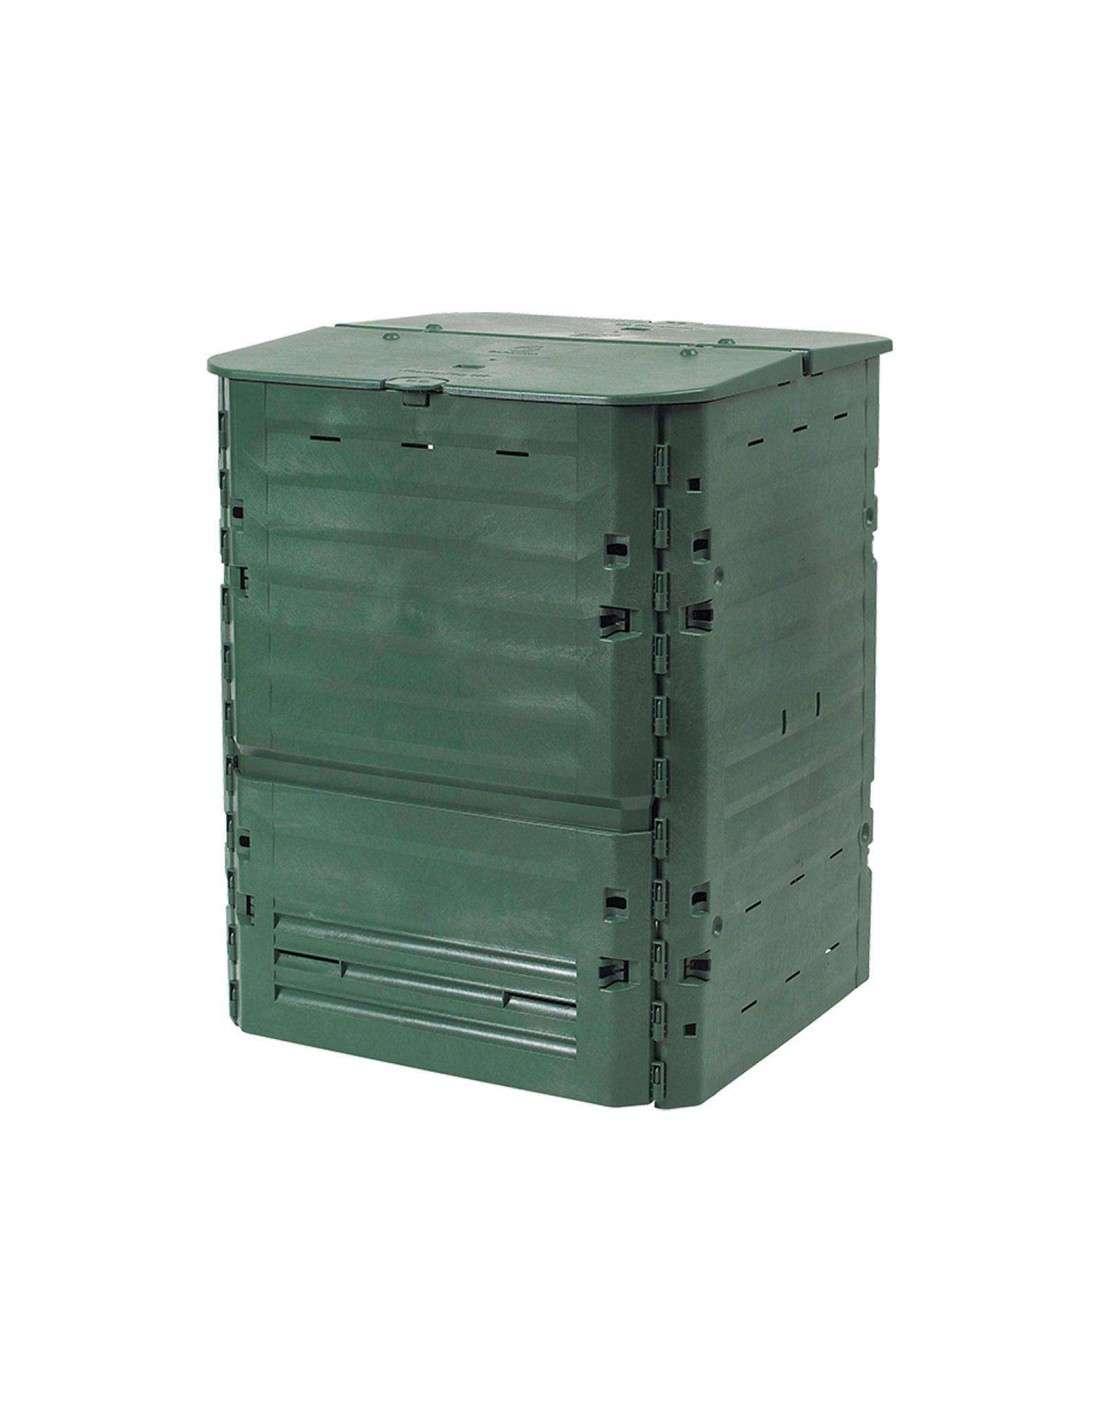 compostador thermo king 400 litros solo 78 75 en cocopot huerto urbano. Black Bedroom Furniture Sets. Home Design Ideas